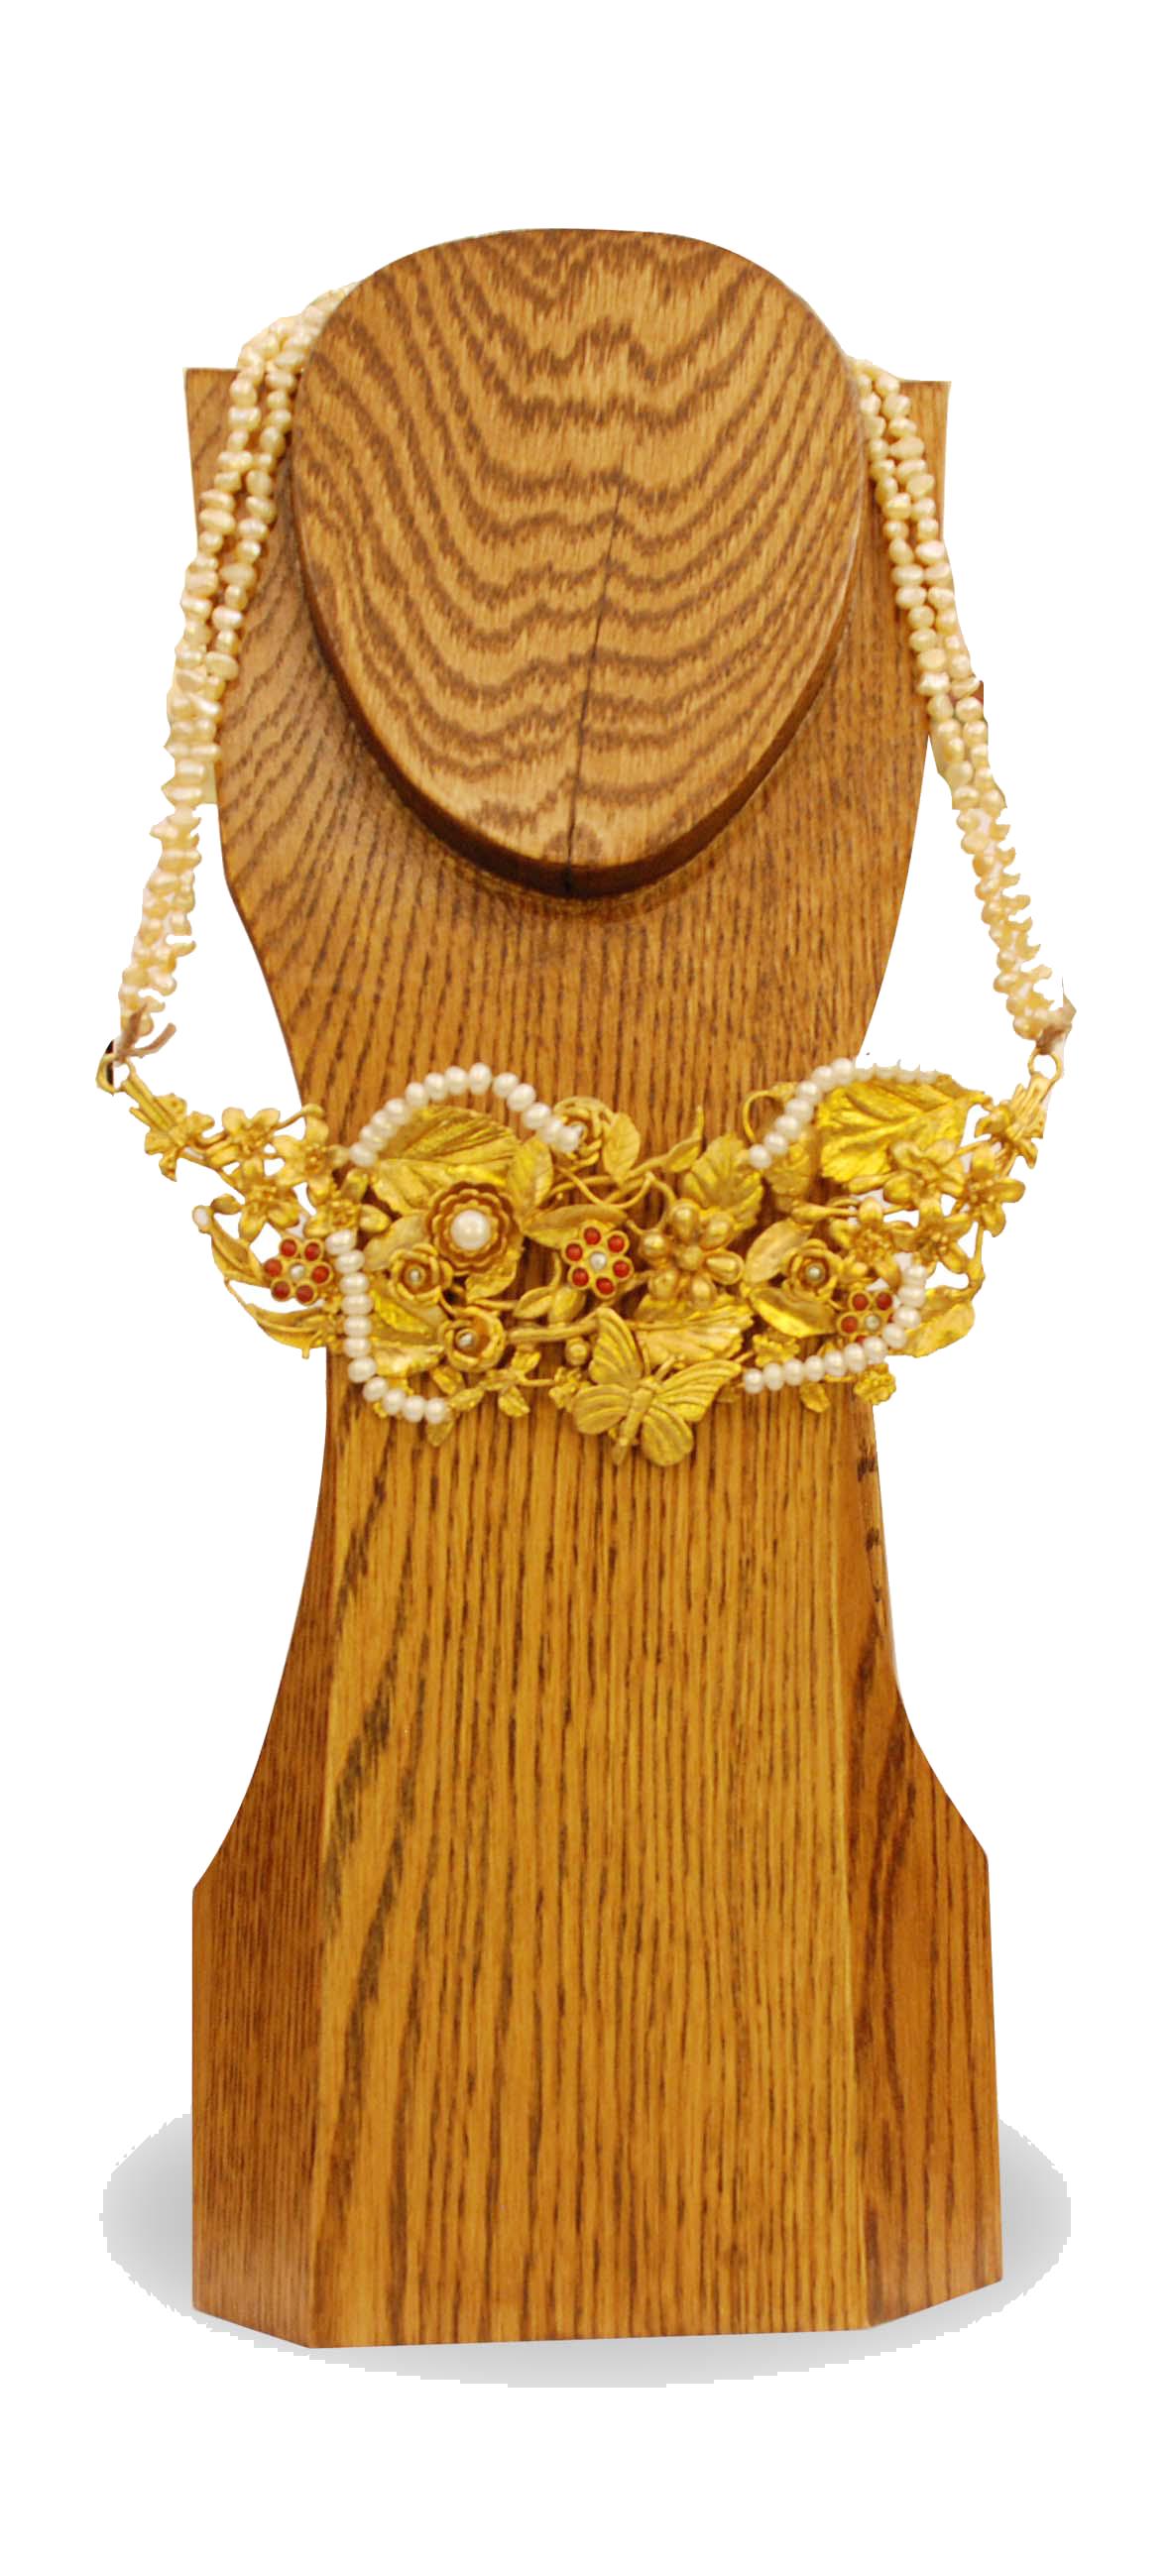 ornina handmade obizn3 pearls neck-tie